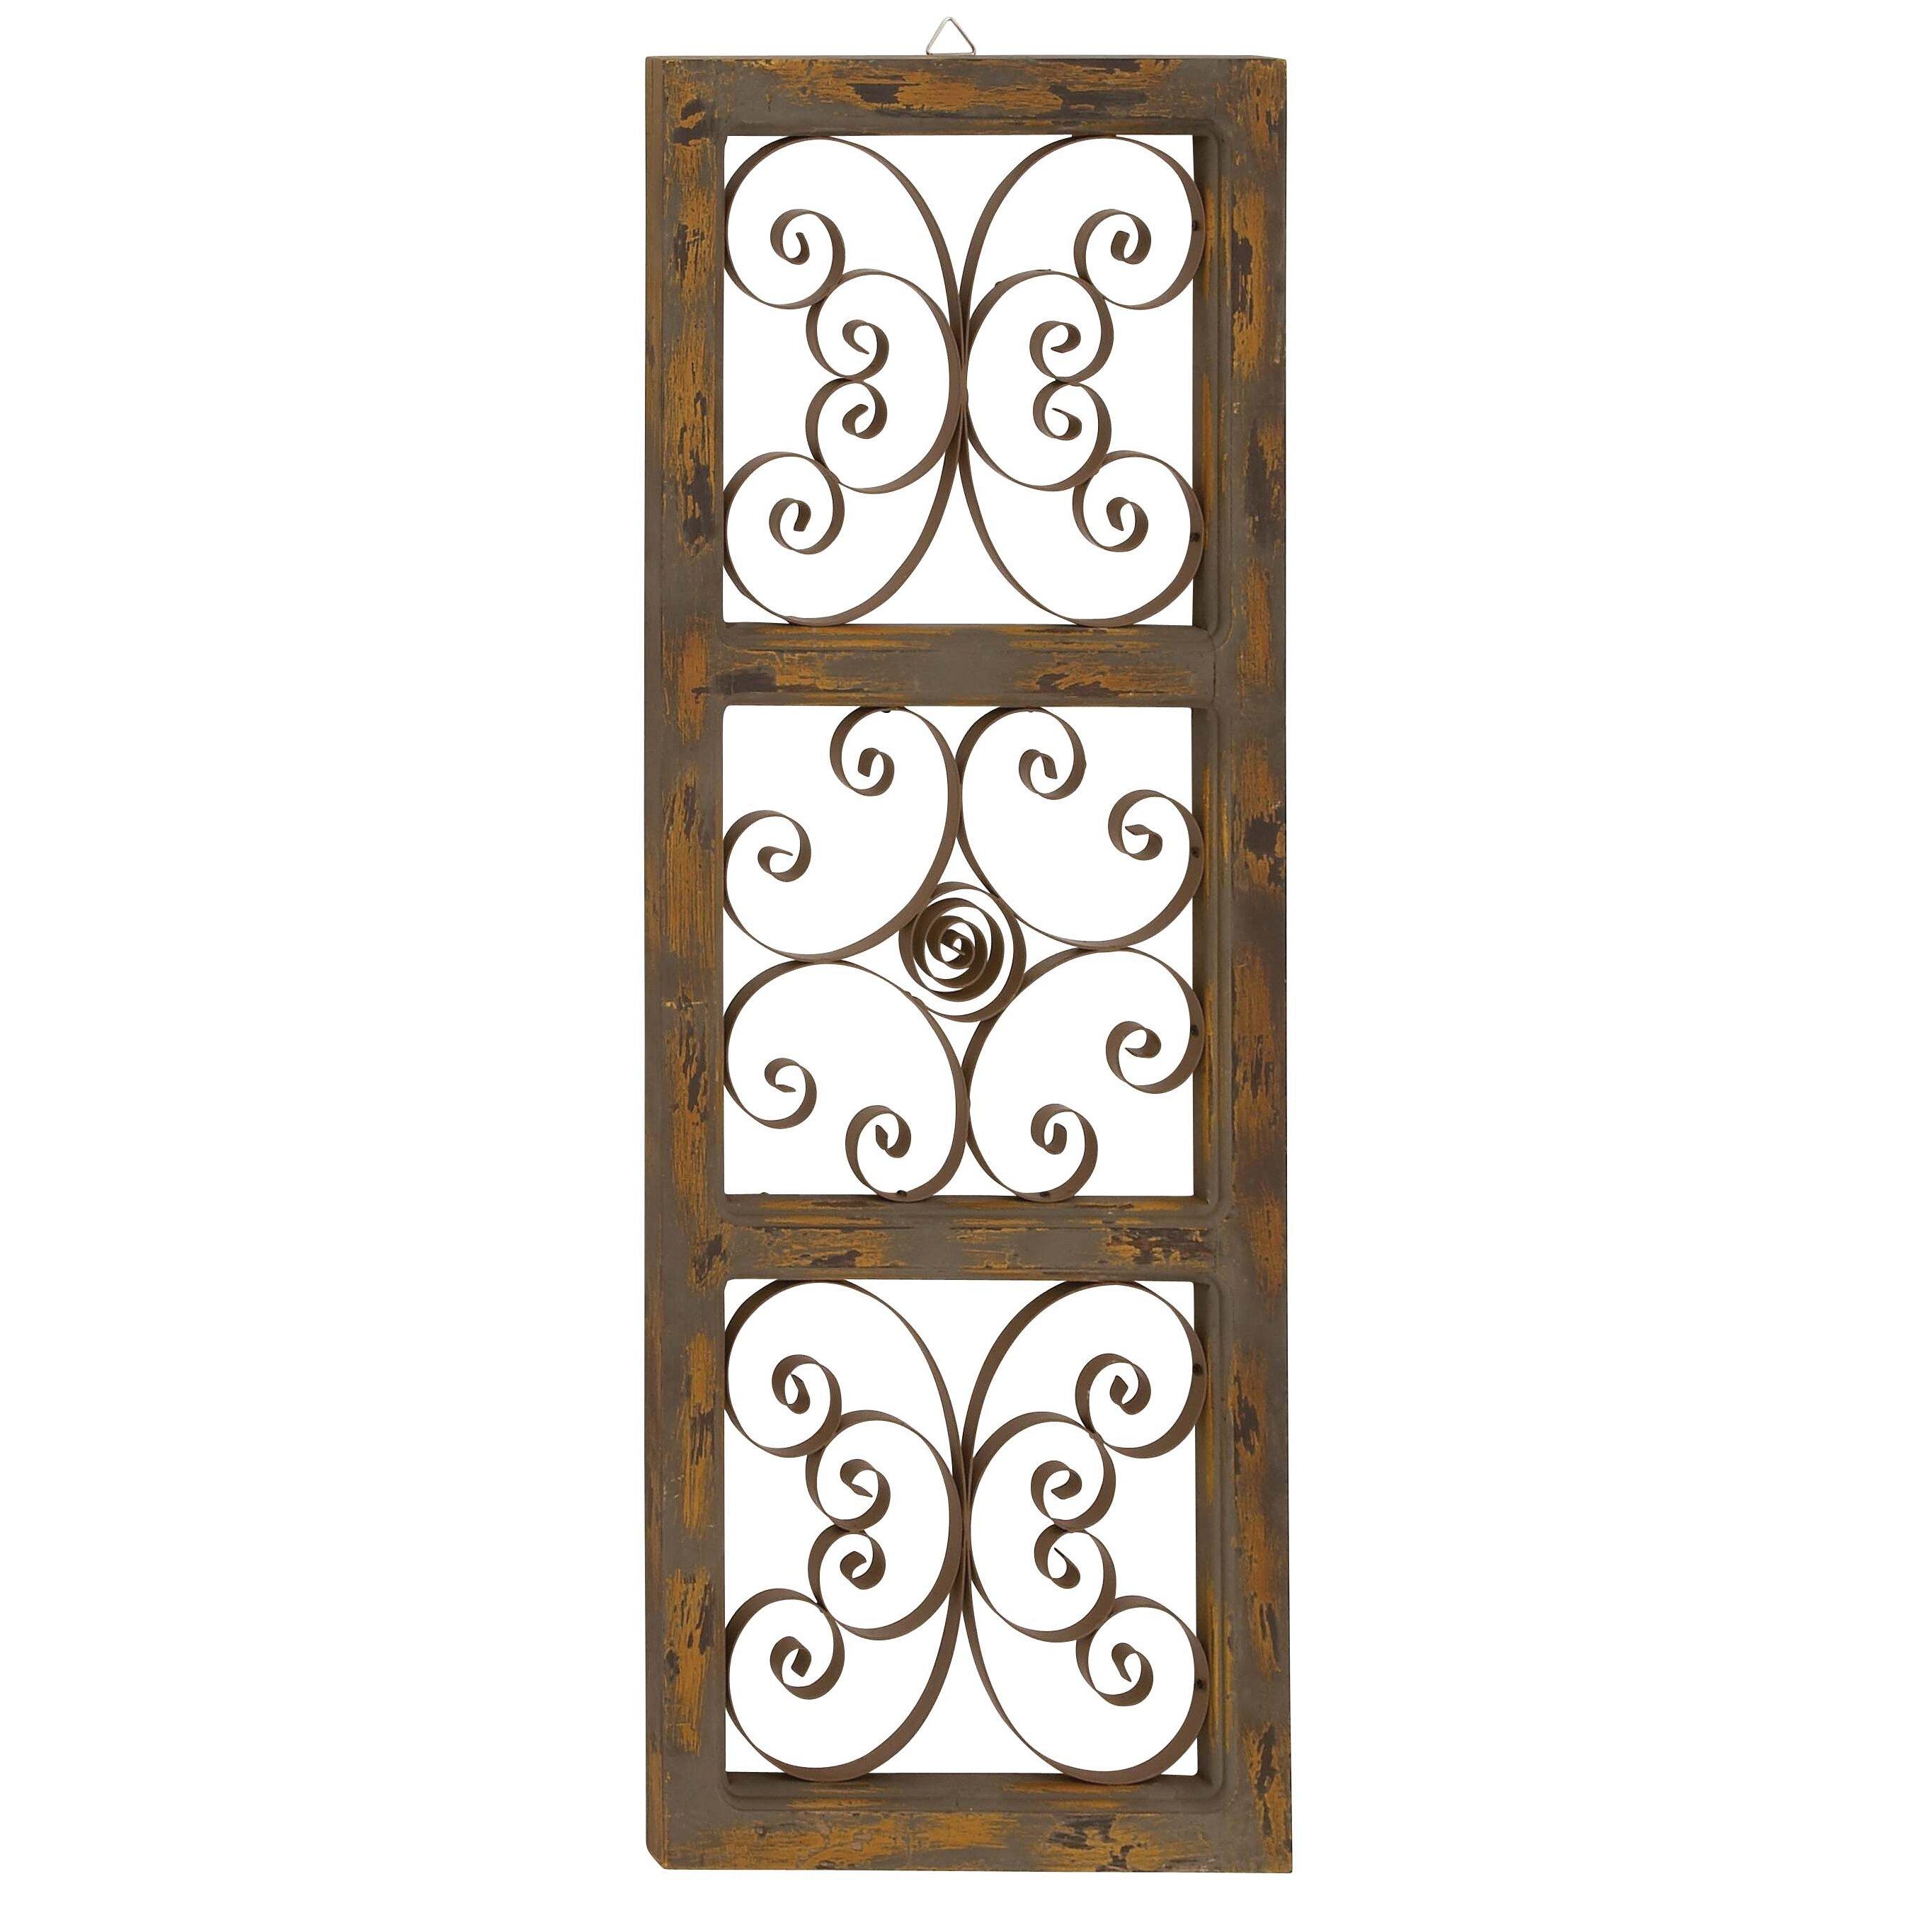 Wall Decor Wood Metal : Cole grey metal and wood wall decor reviews wayfair